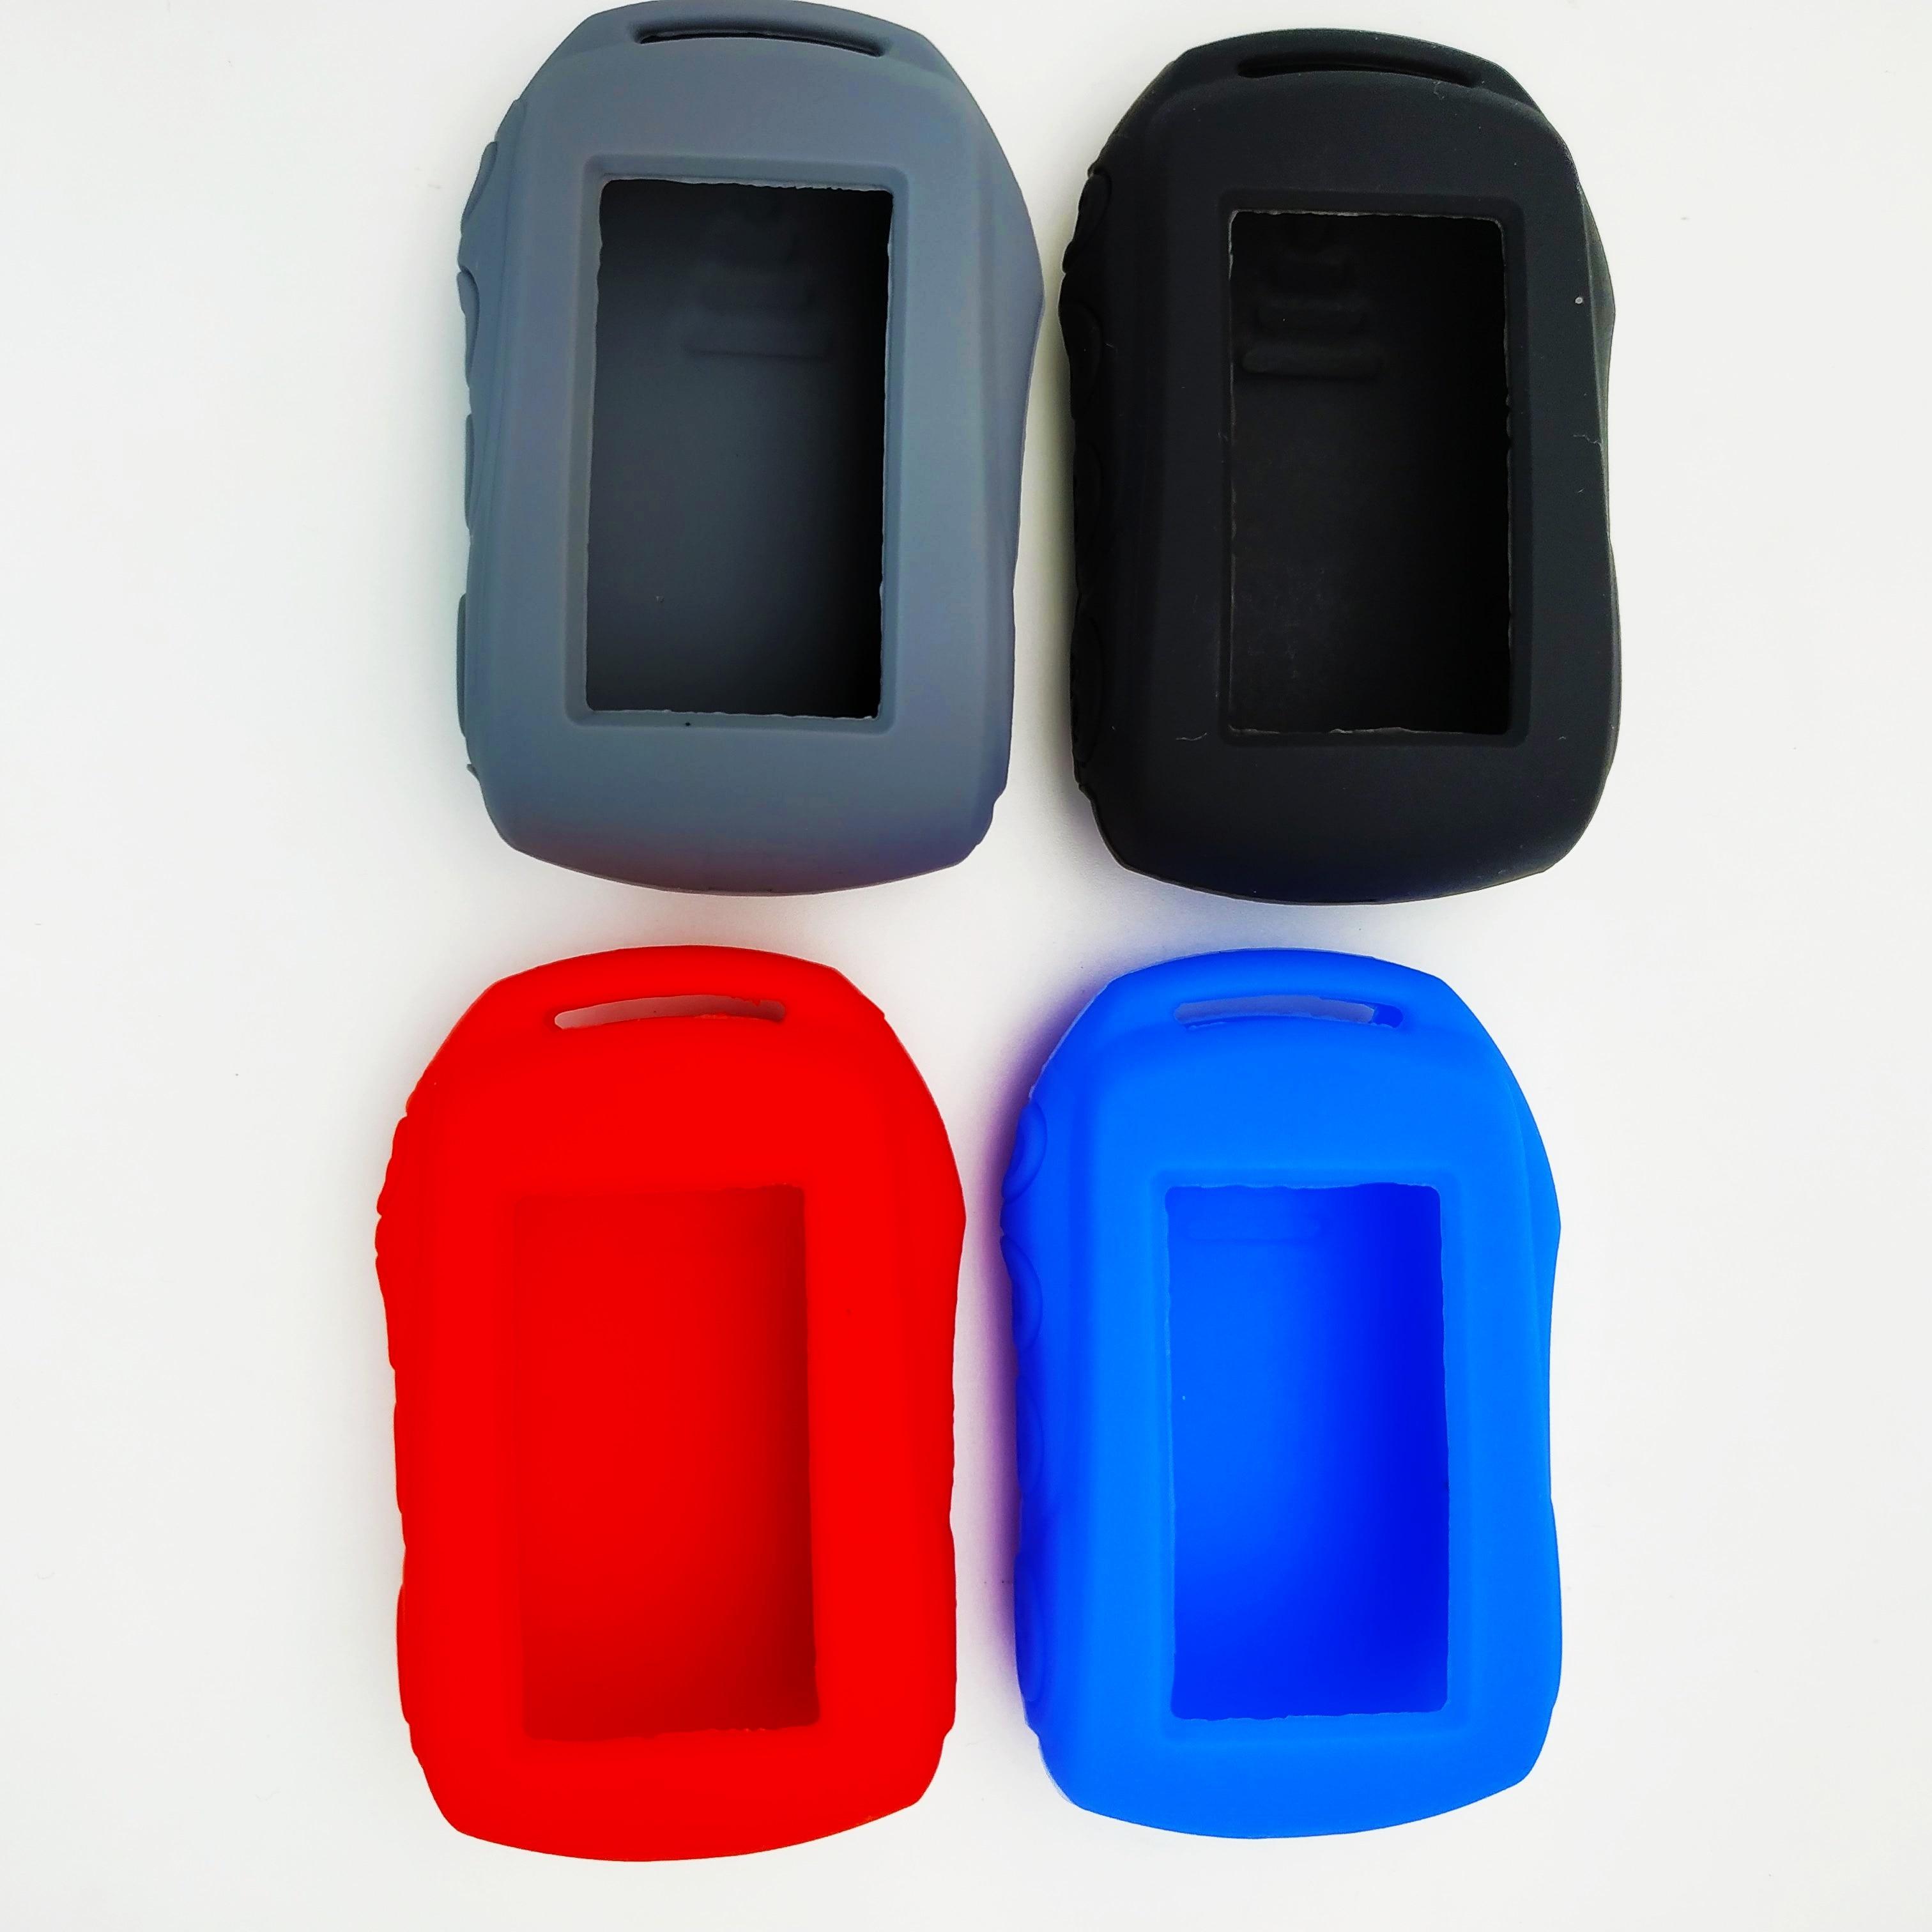 Silicone Case TW9.7 Remote Control Key Fob For Tomahawk 9.7 TW9.9 TW 9.9 Two Way Car Alarm System Tomahawk Fob Chain Keychain